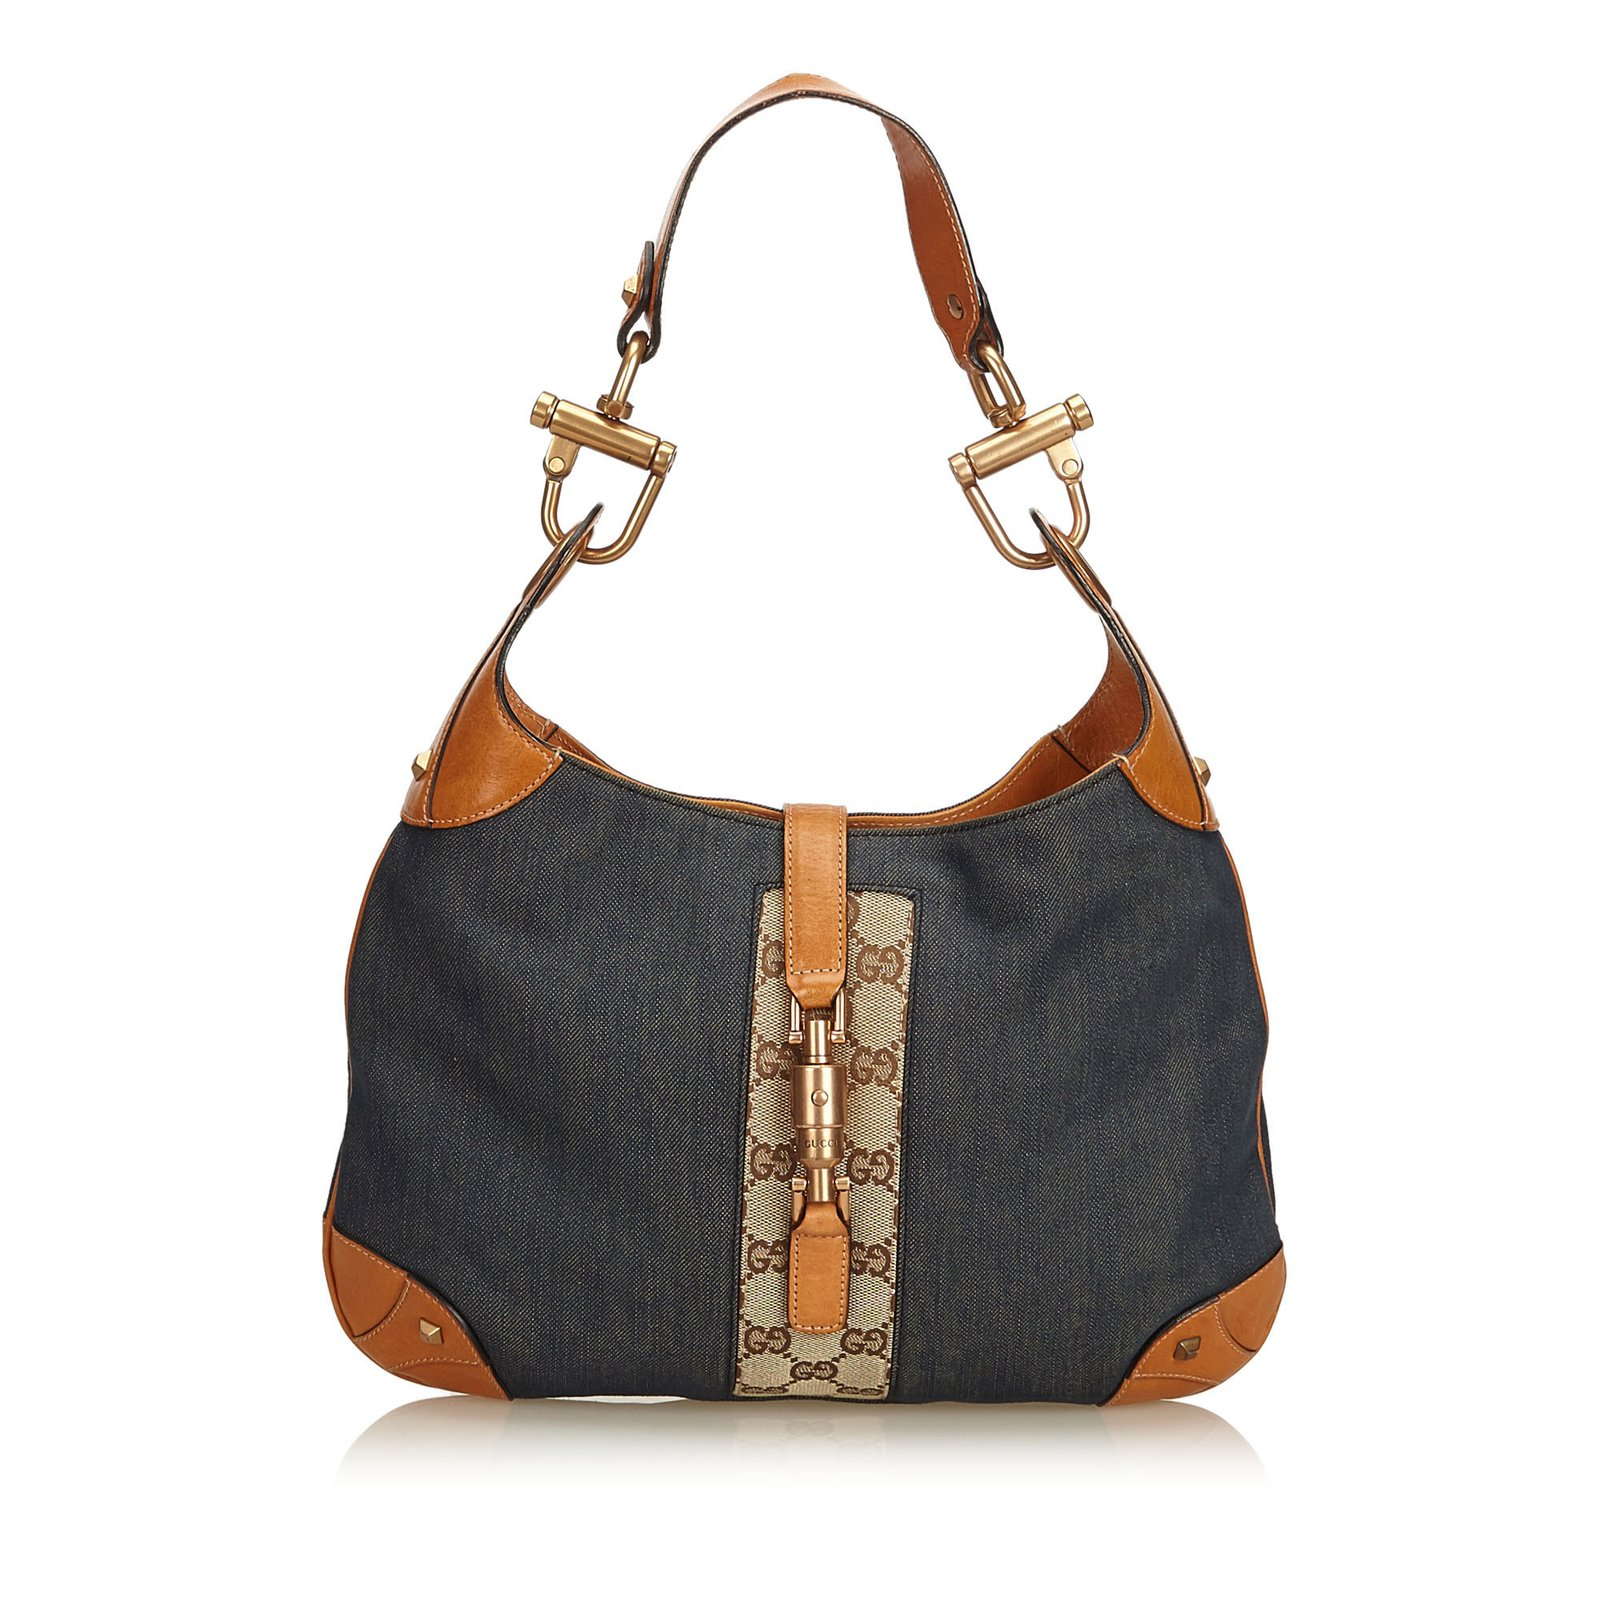 f31ccfb2df63c Gucci Nailhead New Jackie Shoulder Bag Handbags Leather